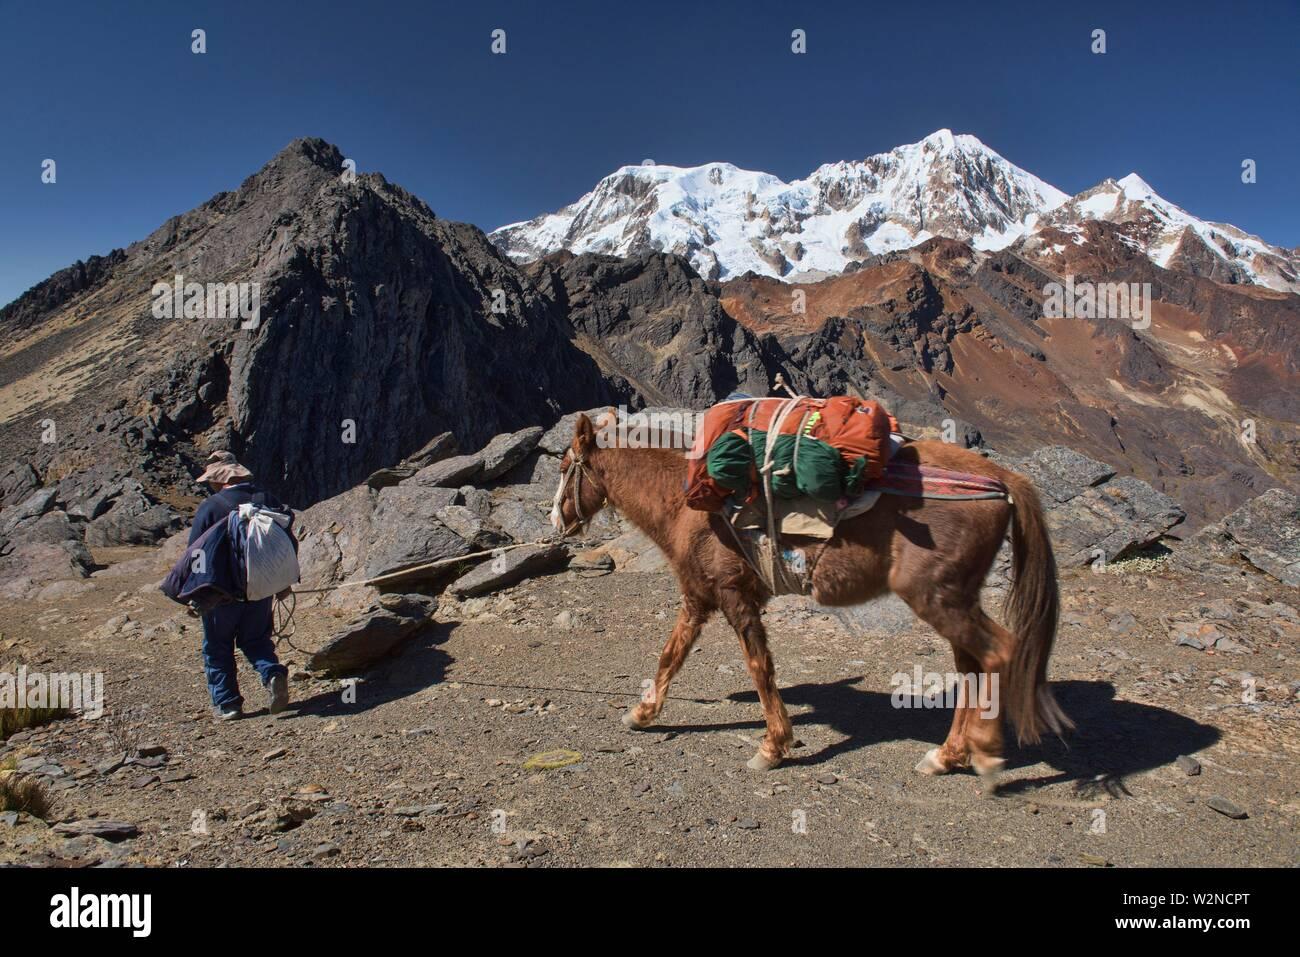 Arriero and mule crossing the Abra Illampu Pass, Cordillera Real Traverse, Bolivia. - Stock Image